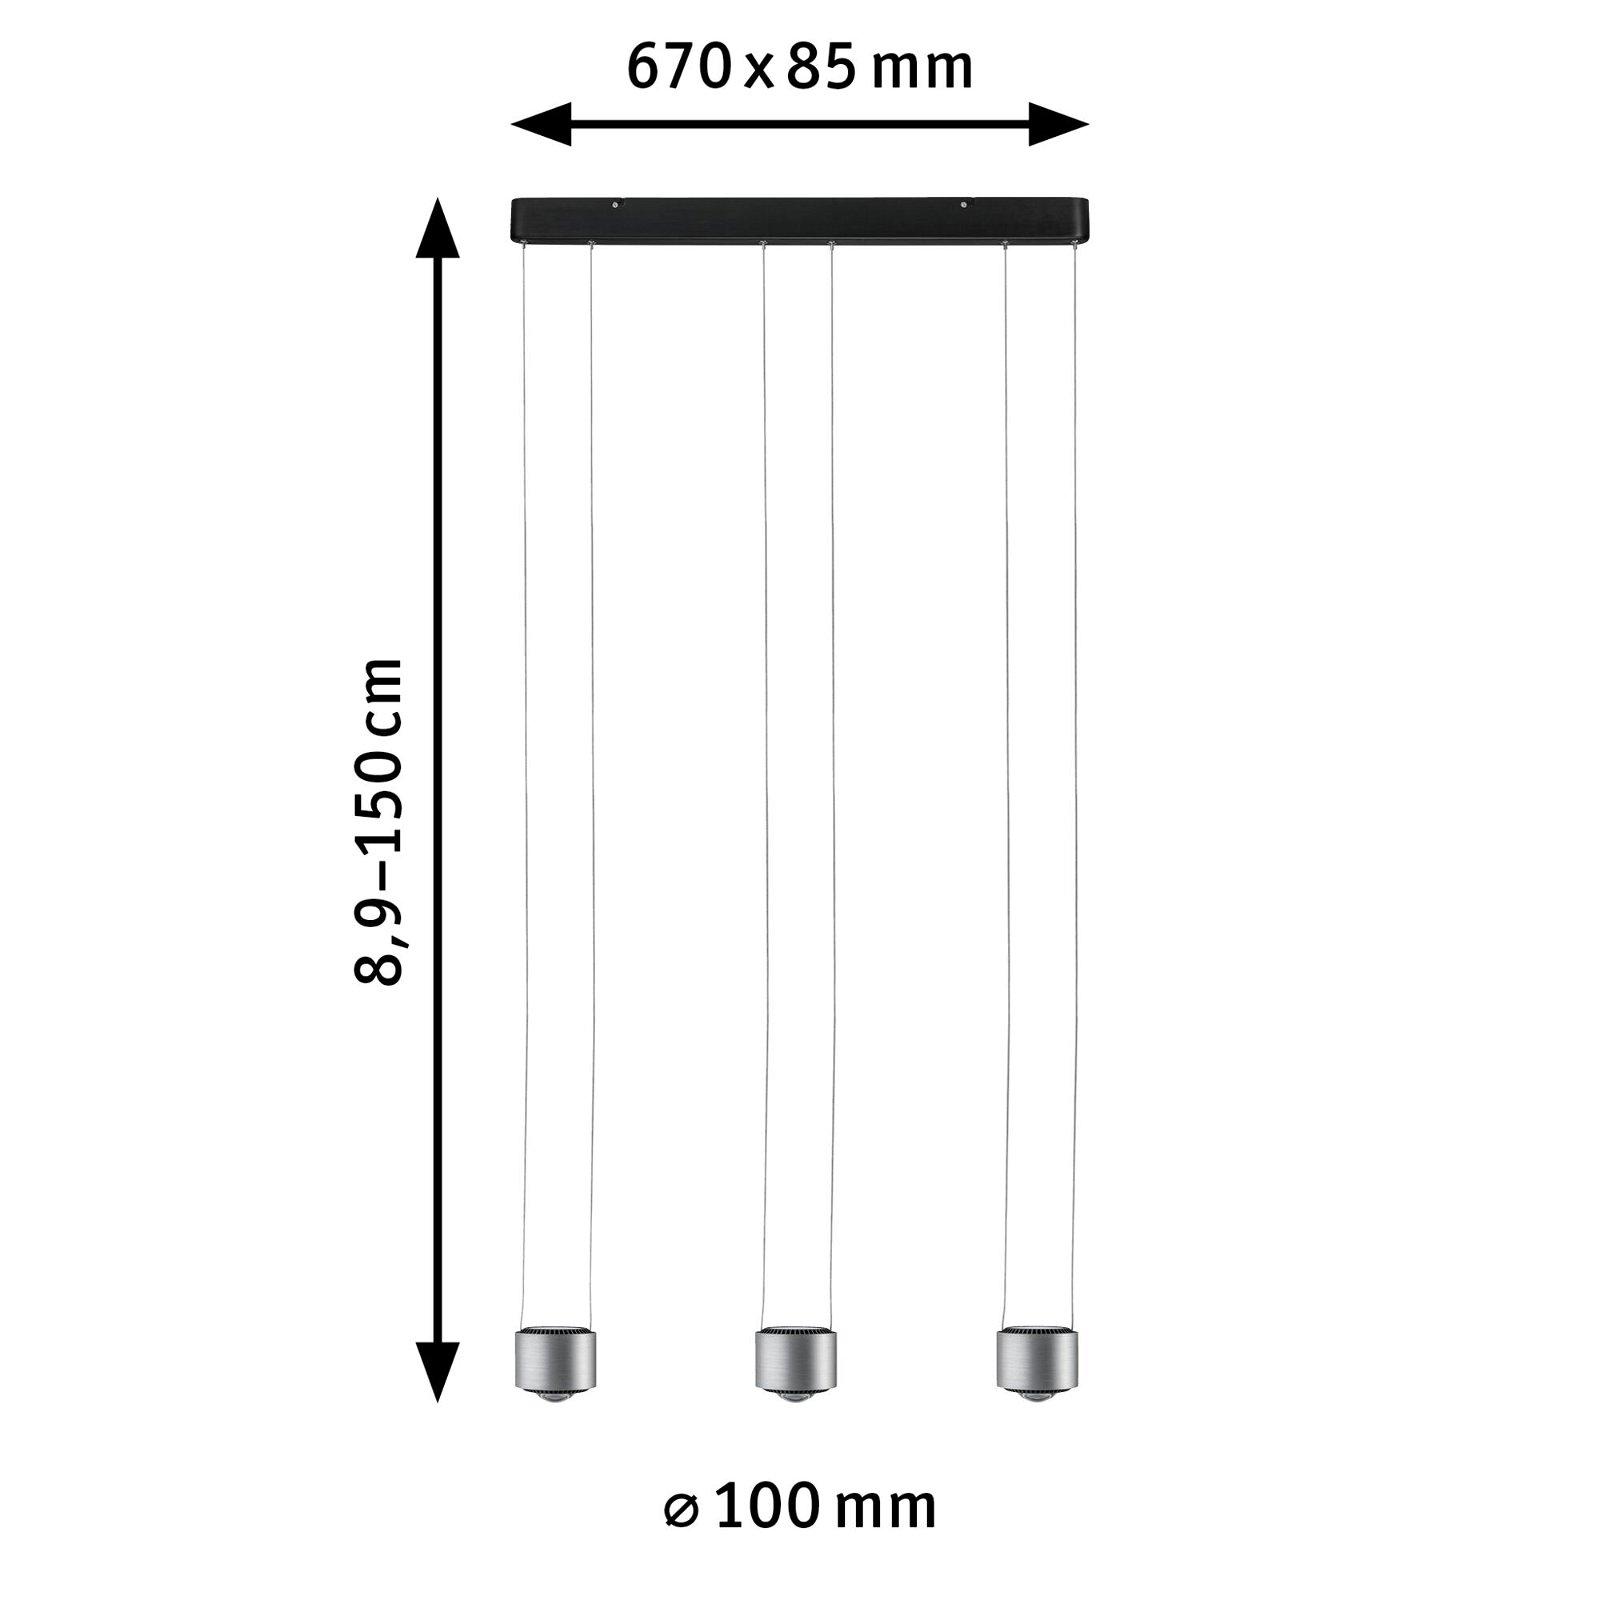 LED Pendelleuchte Aldan 2700K 3x1570lm 3x5 / 3x4W Schwarz/Alu gebürstet